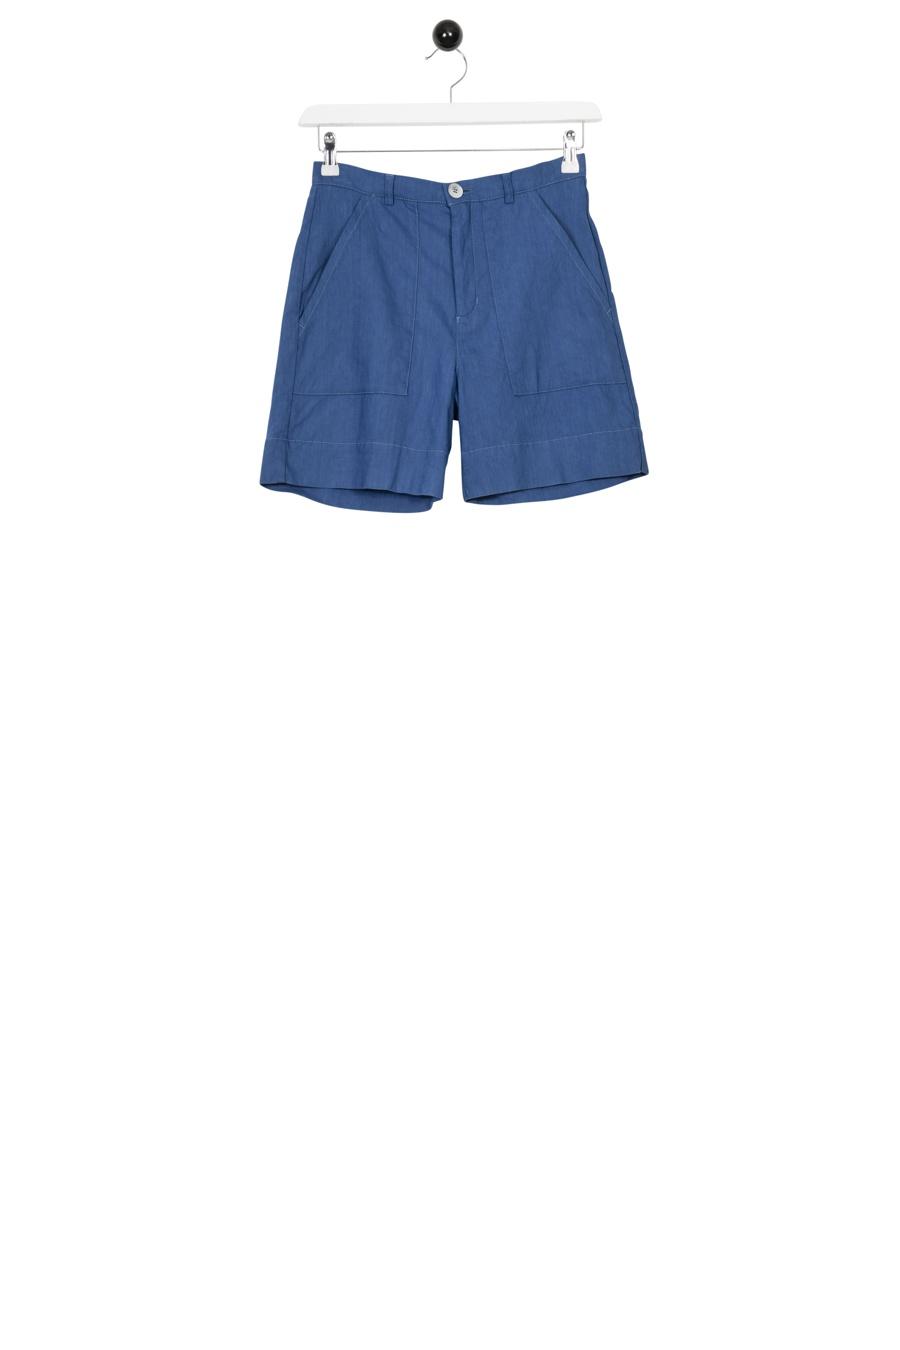 Nimes Shorts